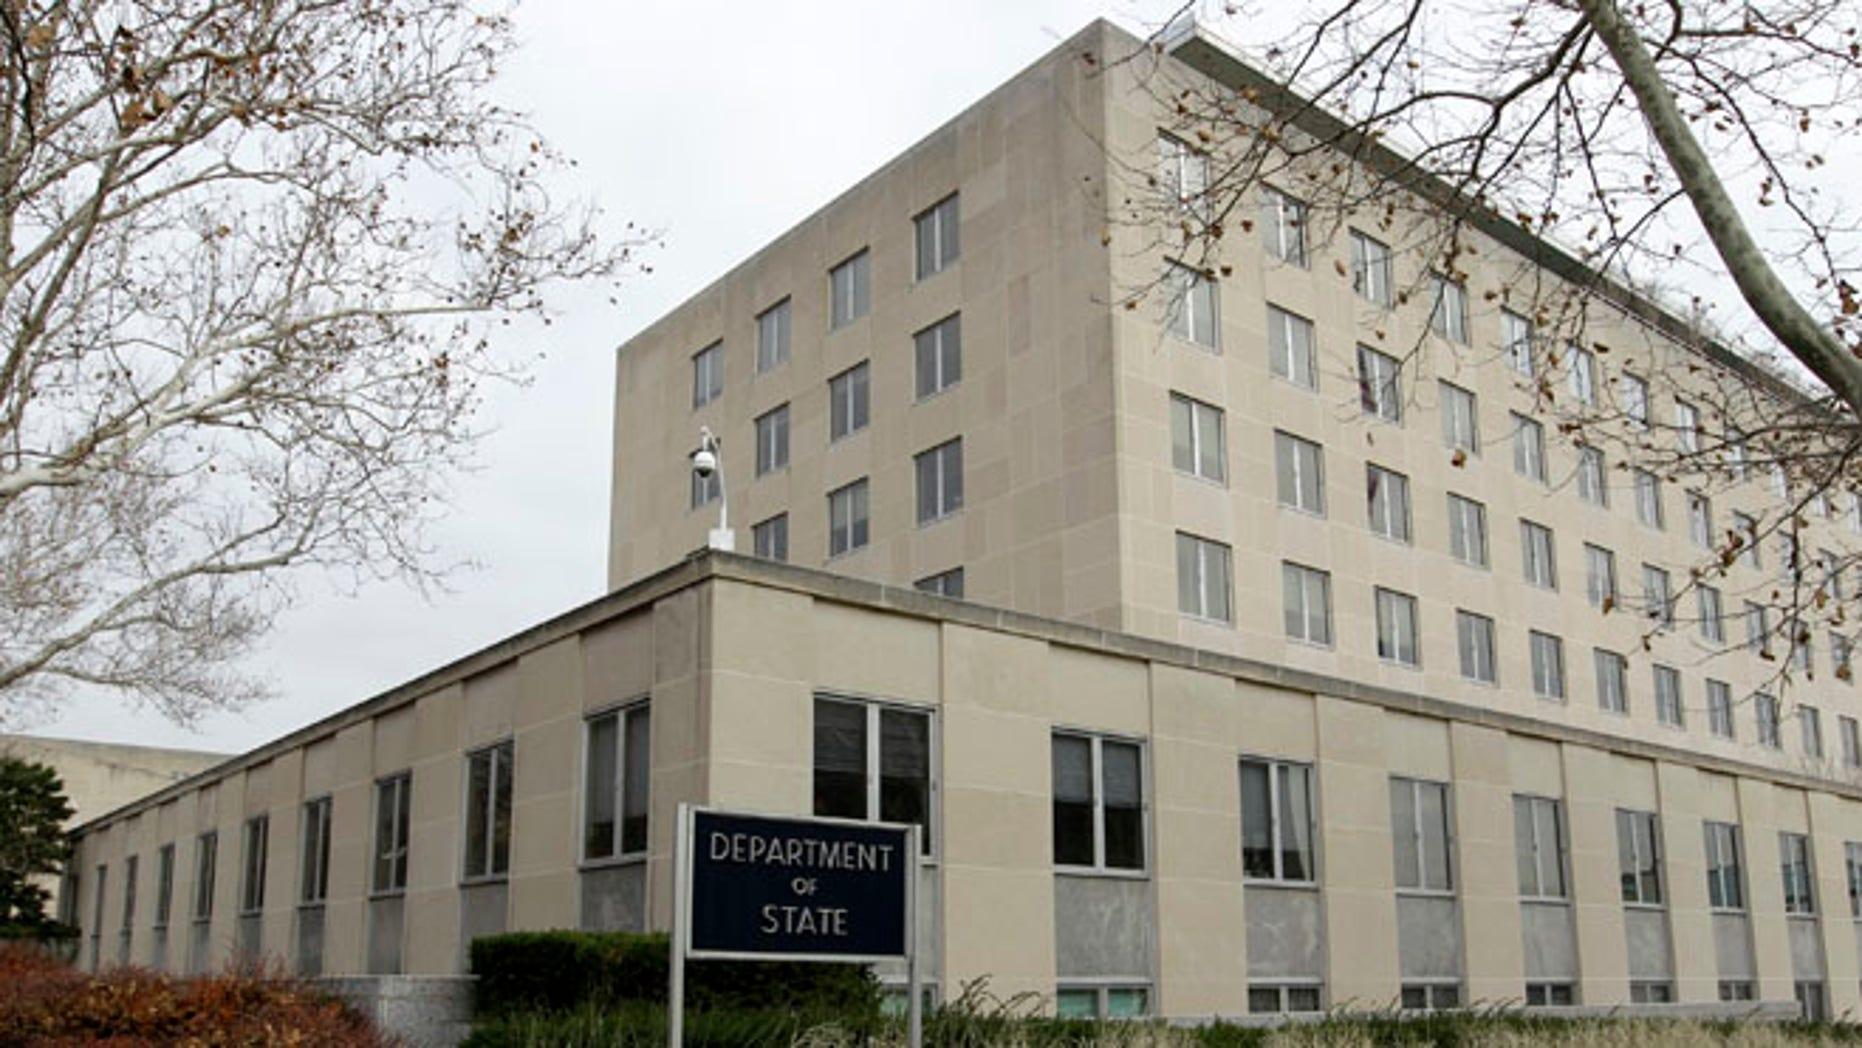 Dec. 15, 2014: State Department in Washington, D.C.